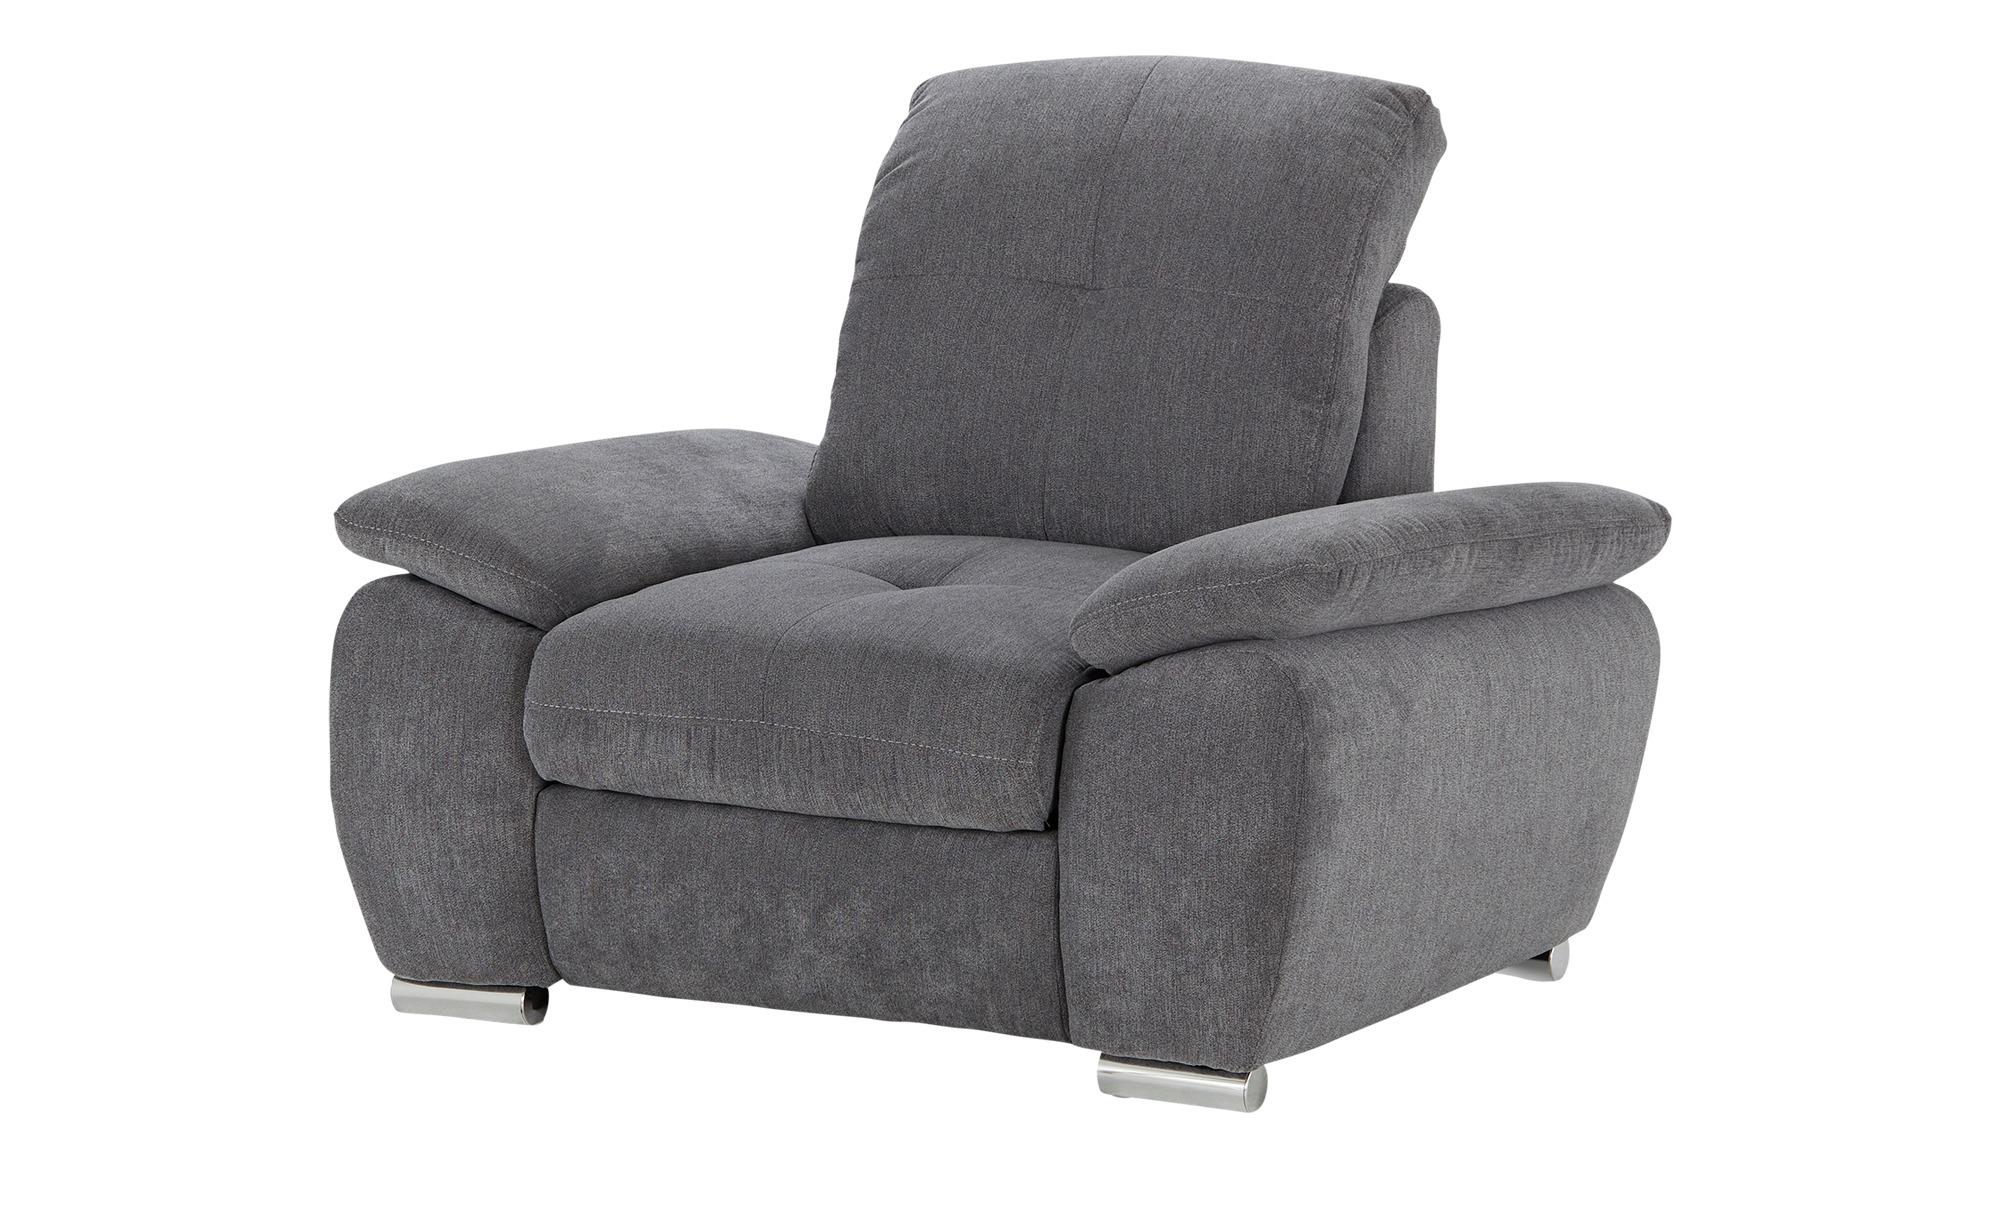 Sessel  Gladys ¦ grau ¦ Maße (cm): B: 108 H: 89 T: 104 Polstermöbel > Sessel > Polstersessel - Höffner